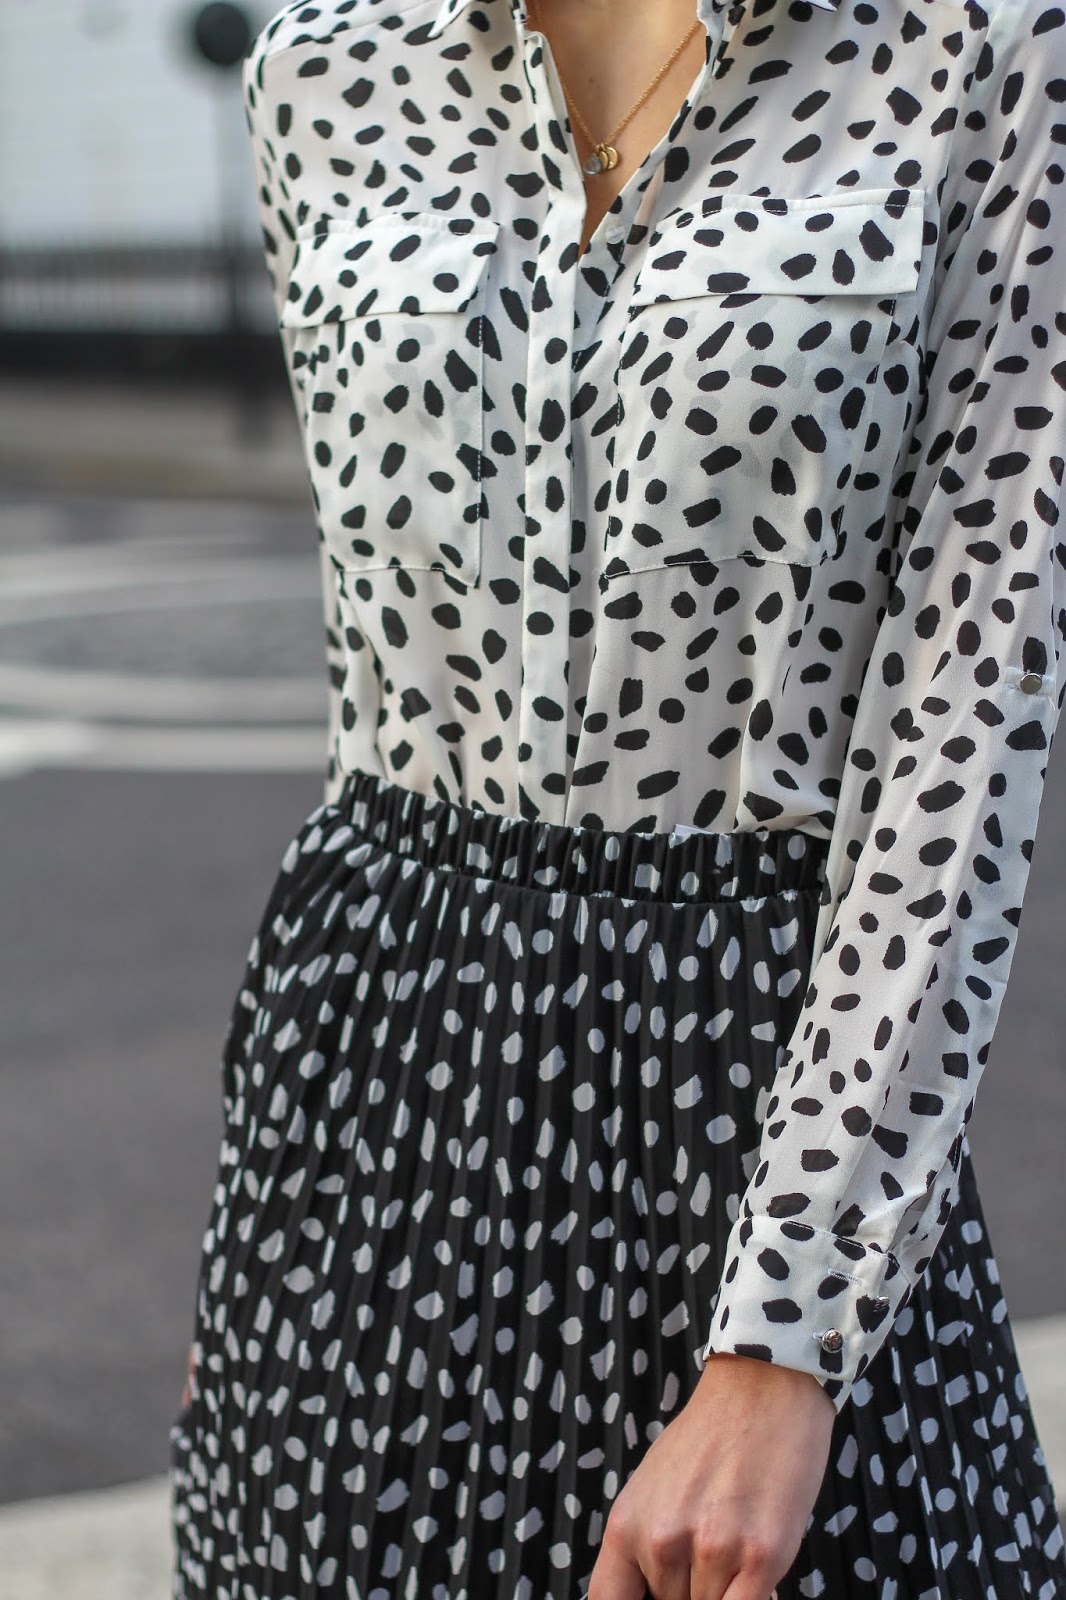 peexo pebble print blouse primark